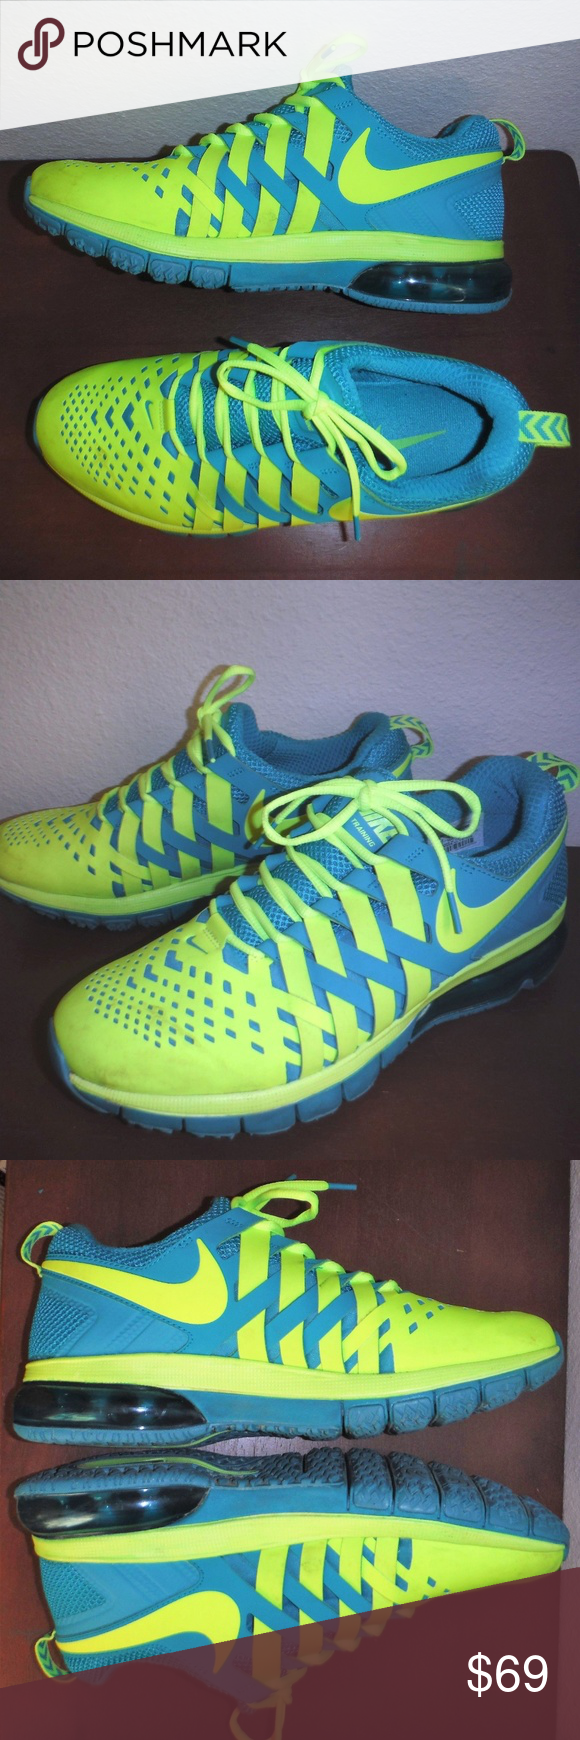 I just added this listing on Poshmark  NIKE Air Max Free Volt Training  Athletic Shoe 10.5.  shopmycloset  poshmark  fashion  shopping  style   forsale  Nike ... 6286a09bd